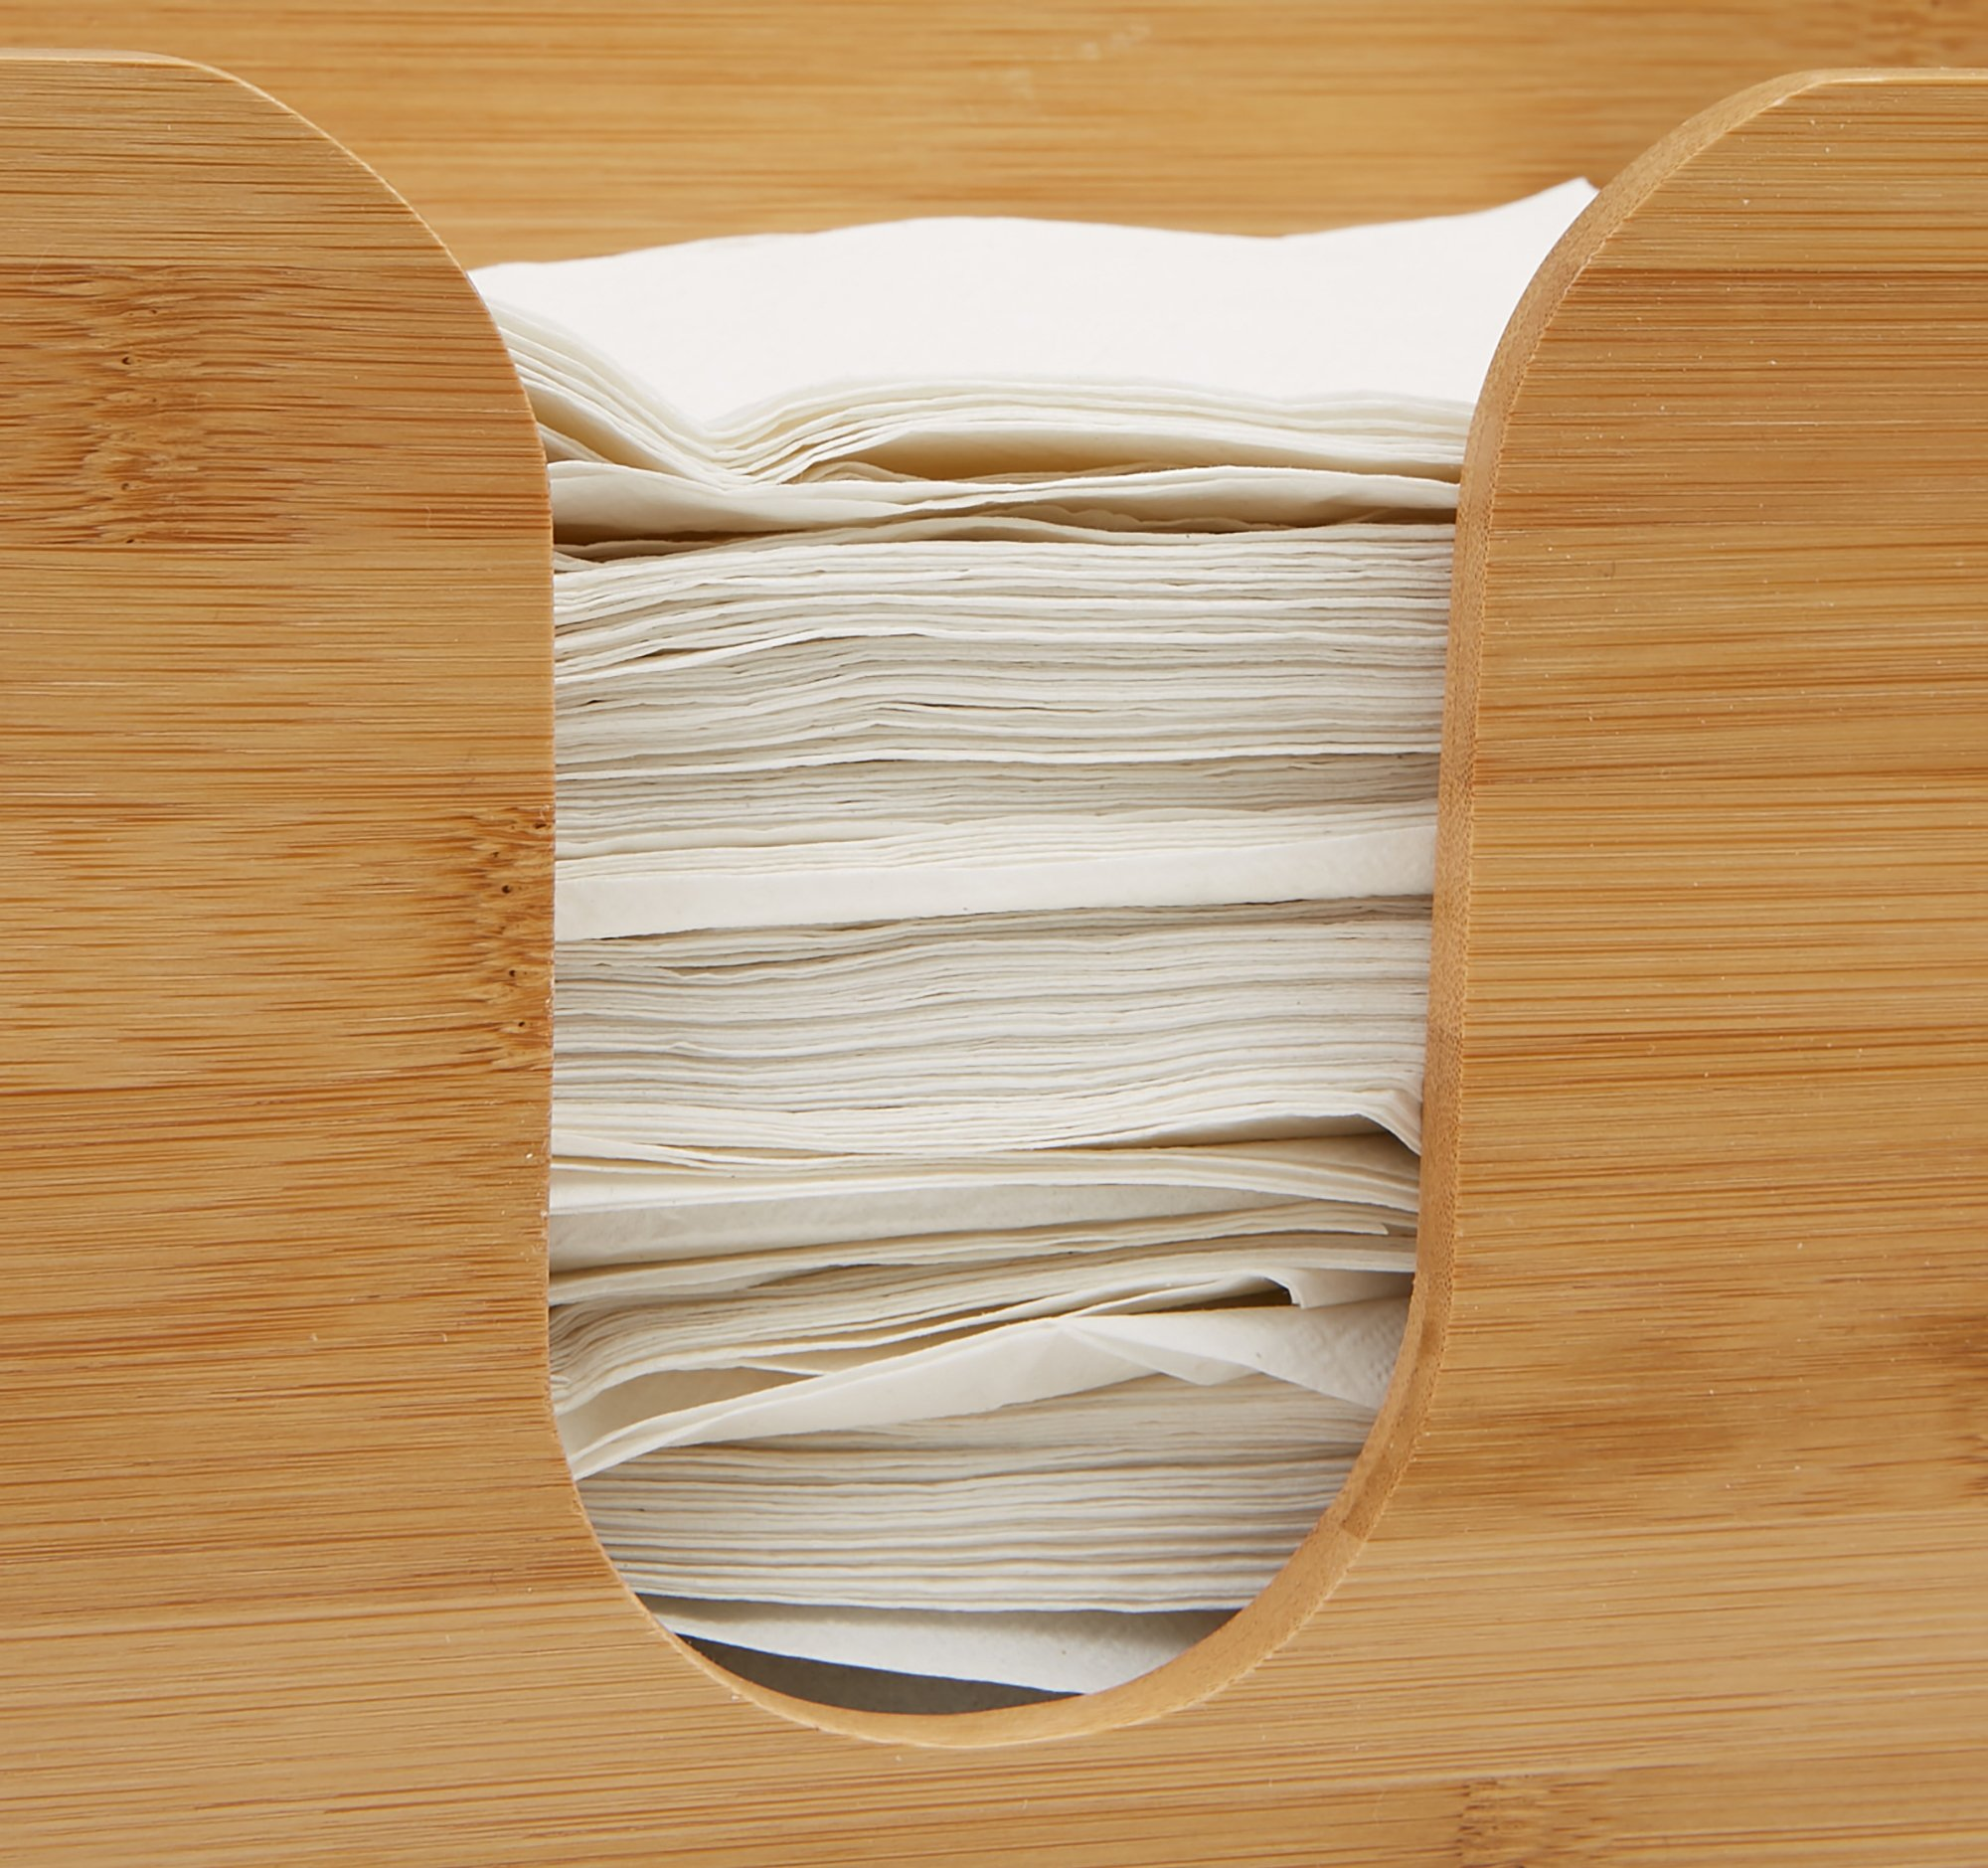 Mind Reader Bamboo Wall Mount Interfold Napkin Dispenser Organizer, Brown by Mind Reader (Image #4)